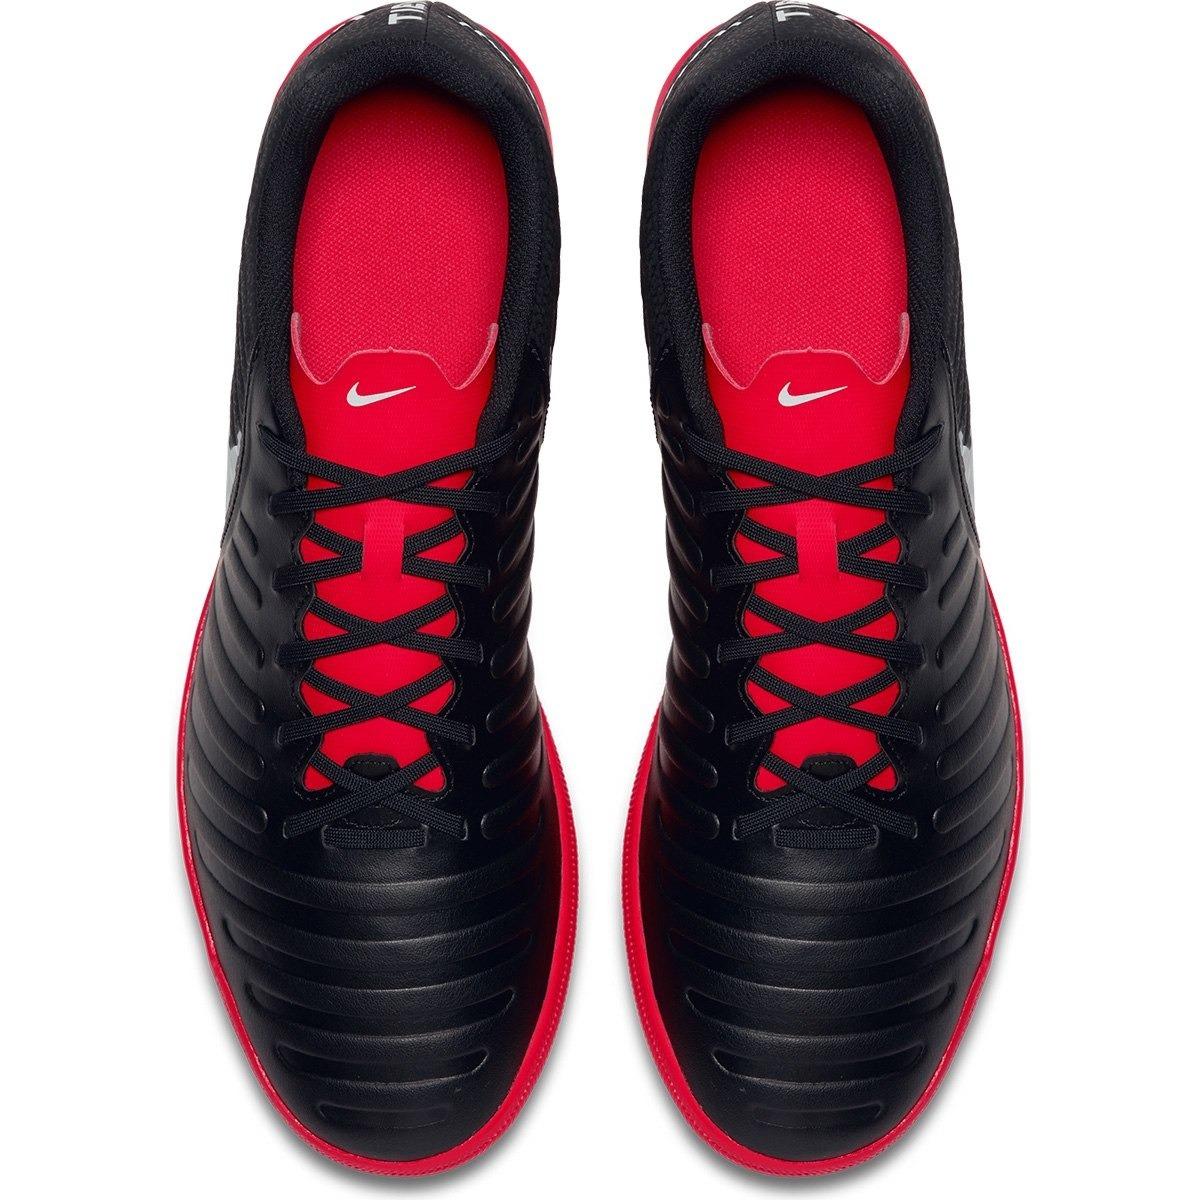 Chuteira Futsal Nike Tiempo Legend 7 Club Ic Masculina - - R  249 560e1d421c4a6